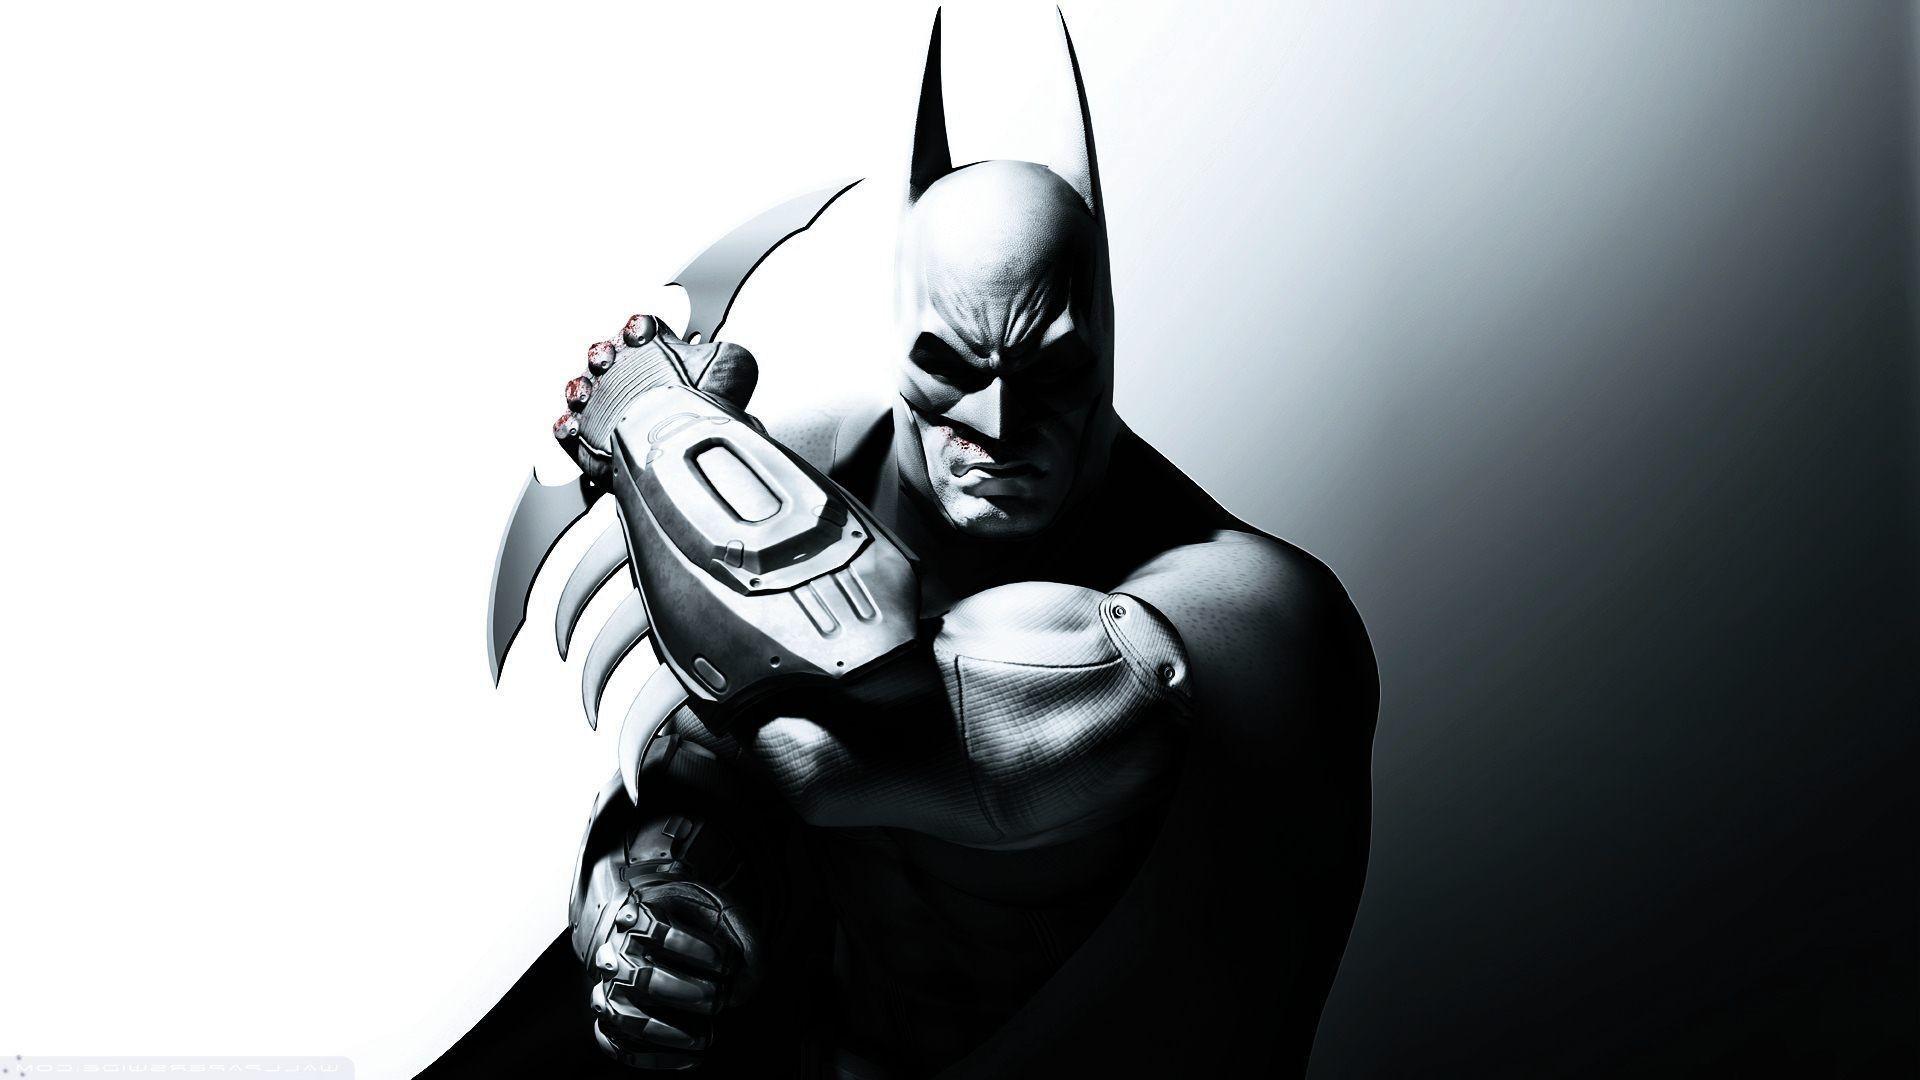 Batman-hd-wallpaper-for-android-61939696.jpg